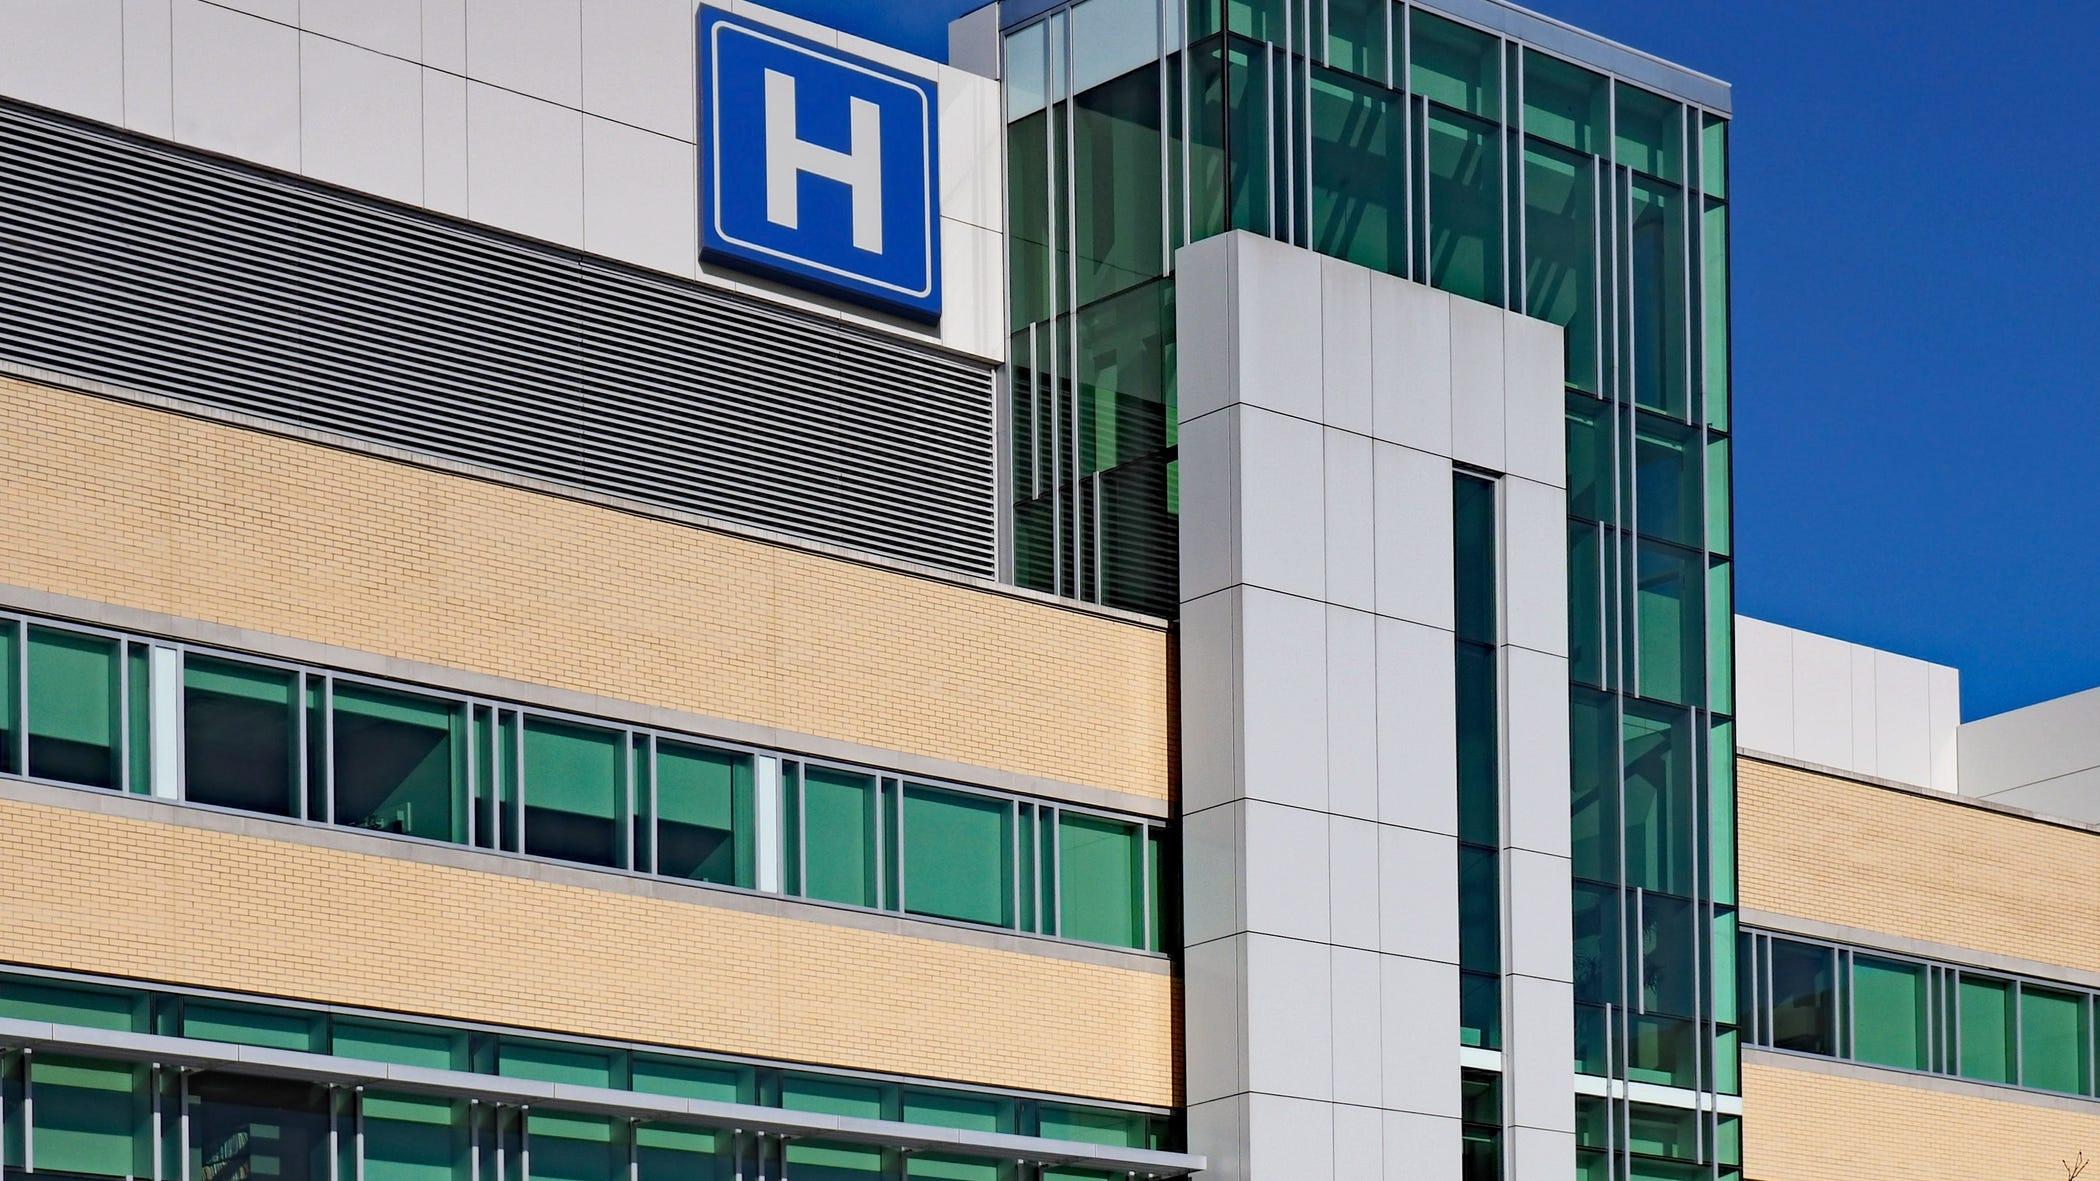 Como Hospitales Se Prepararon Para Huracán Laura En Medio de Pandemia de COVID-19